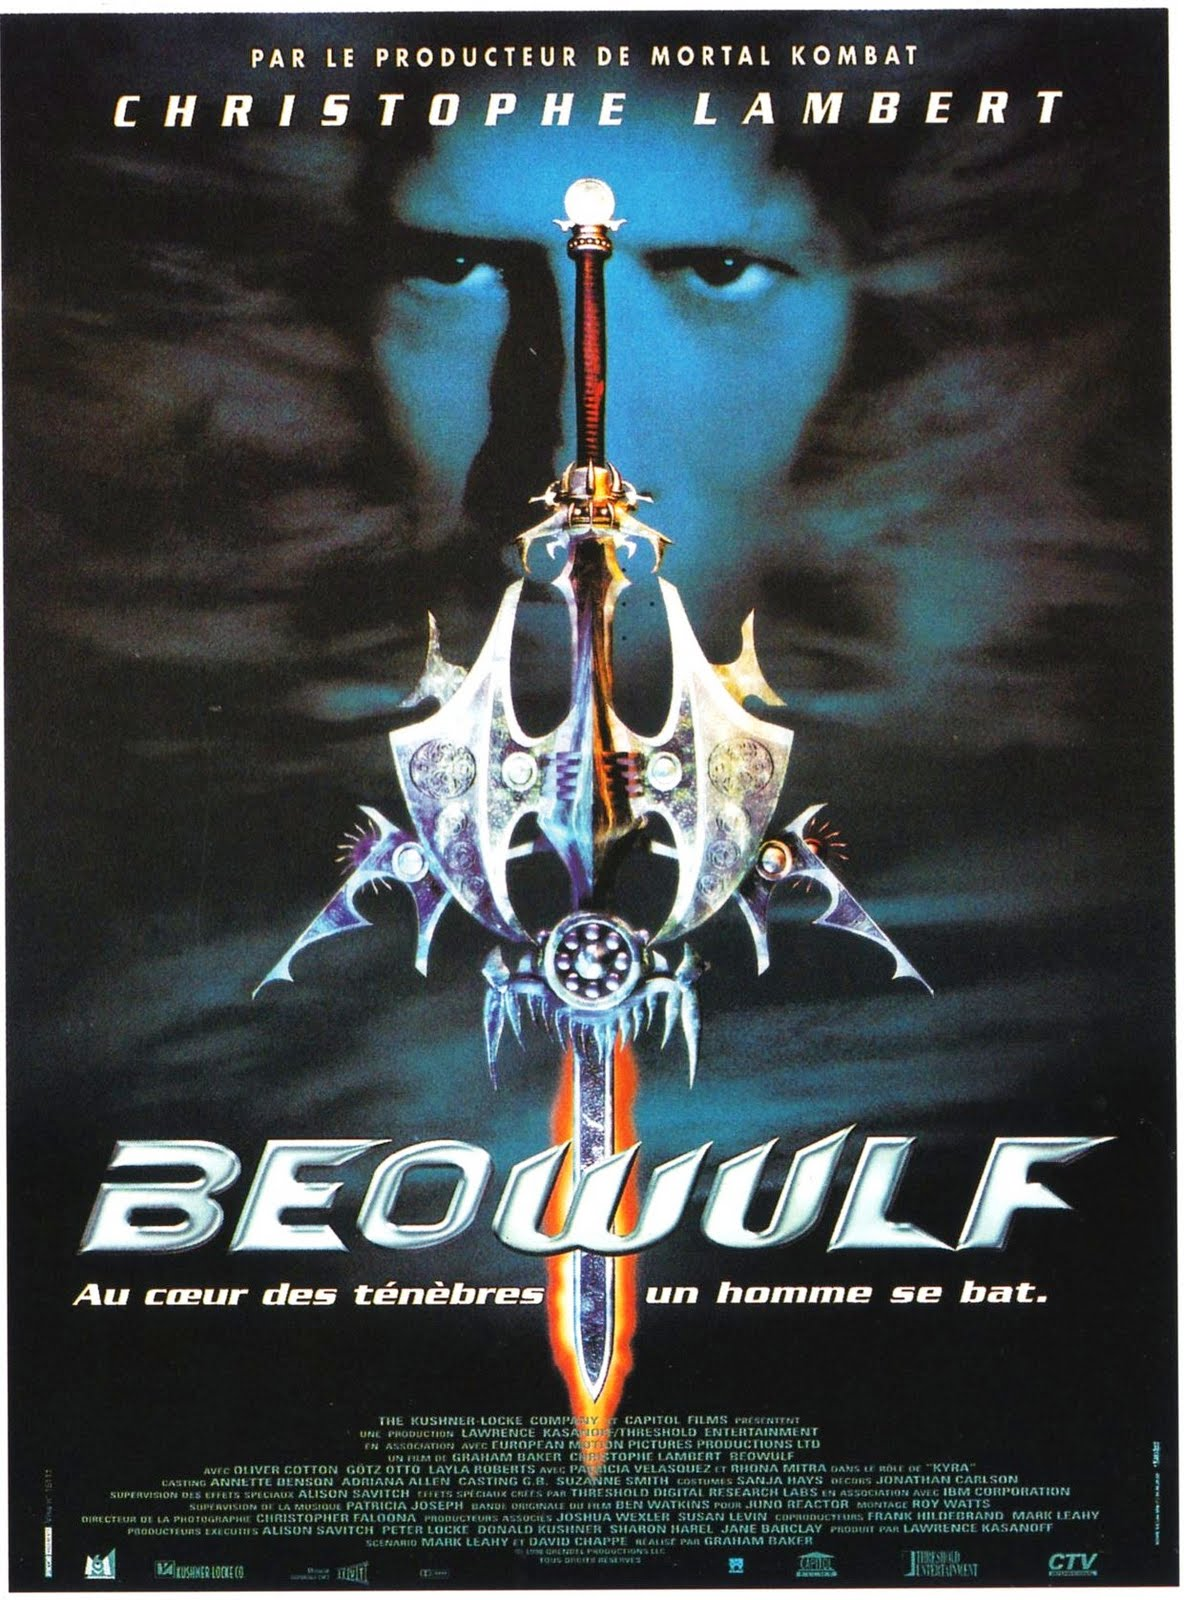 http://1.bp.blogspot.com/-QFIsvVIDbQM/TZSh8cC9-CI/AAAAAAAACco/mHVbiPtBXS8/s1600/4198_Beowulf%2BLa%2BLeyenda.jpg